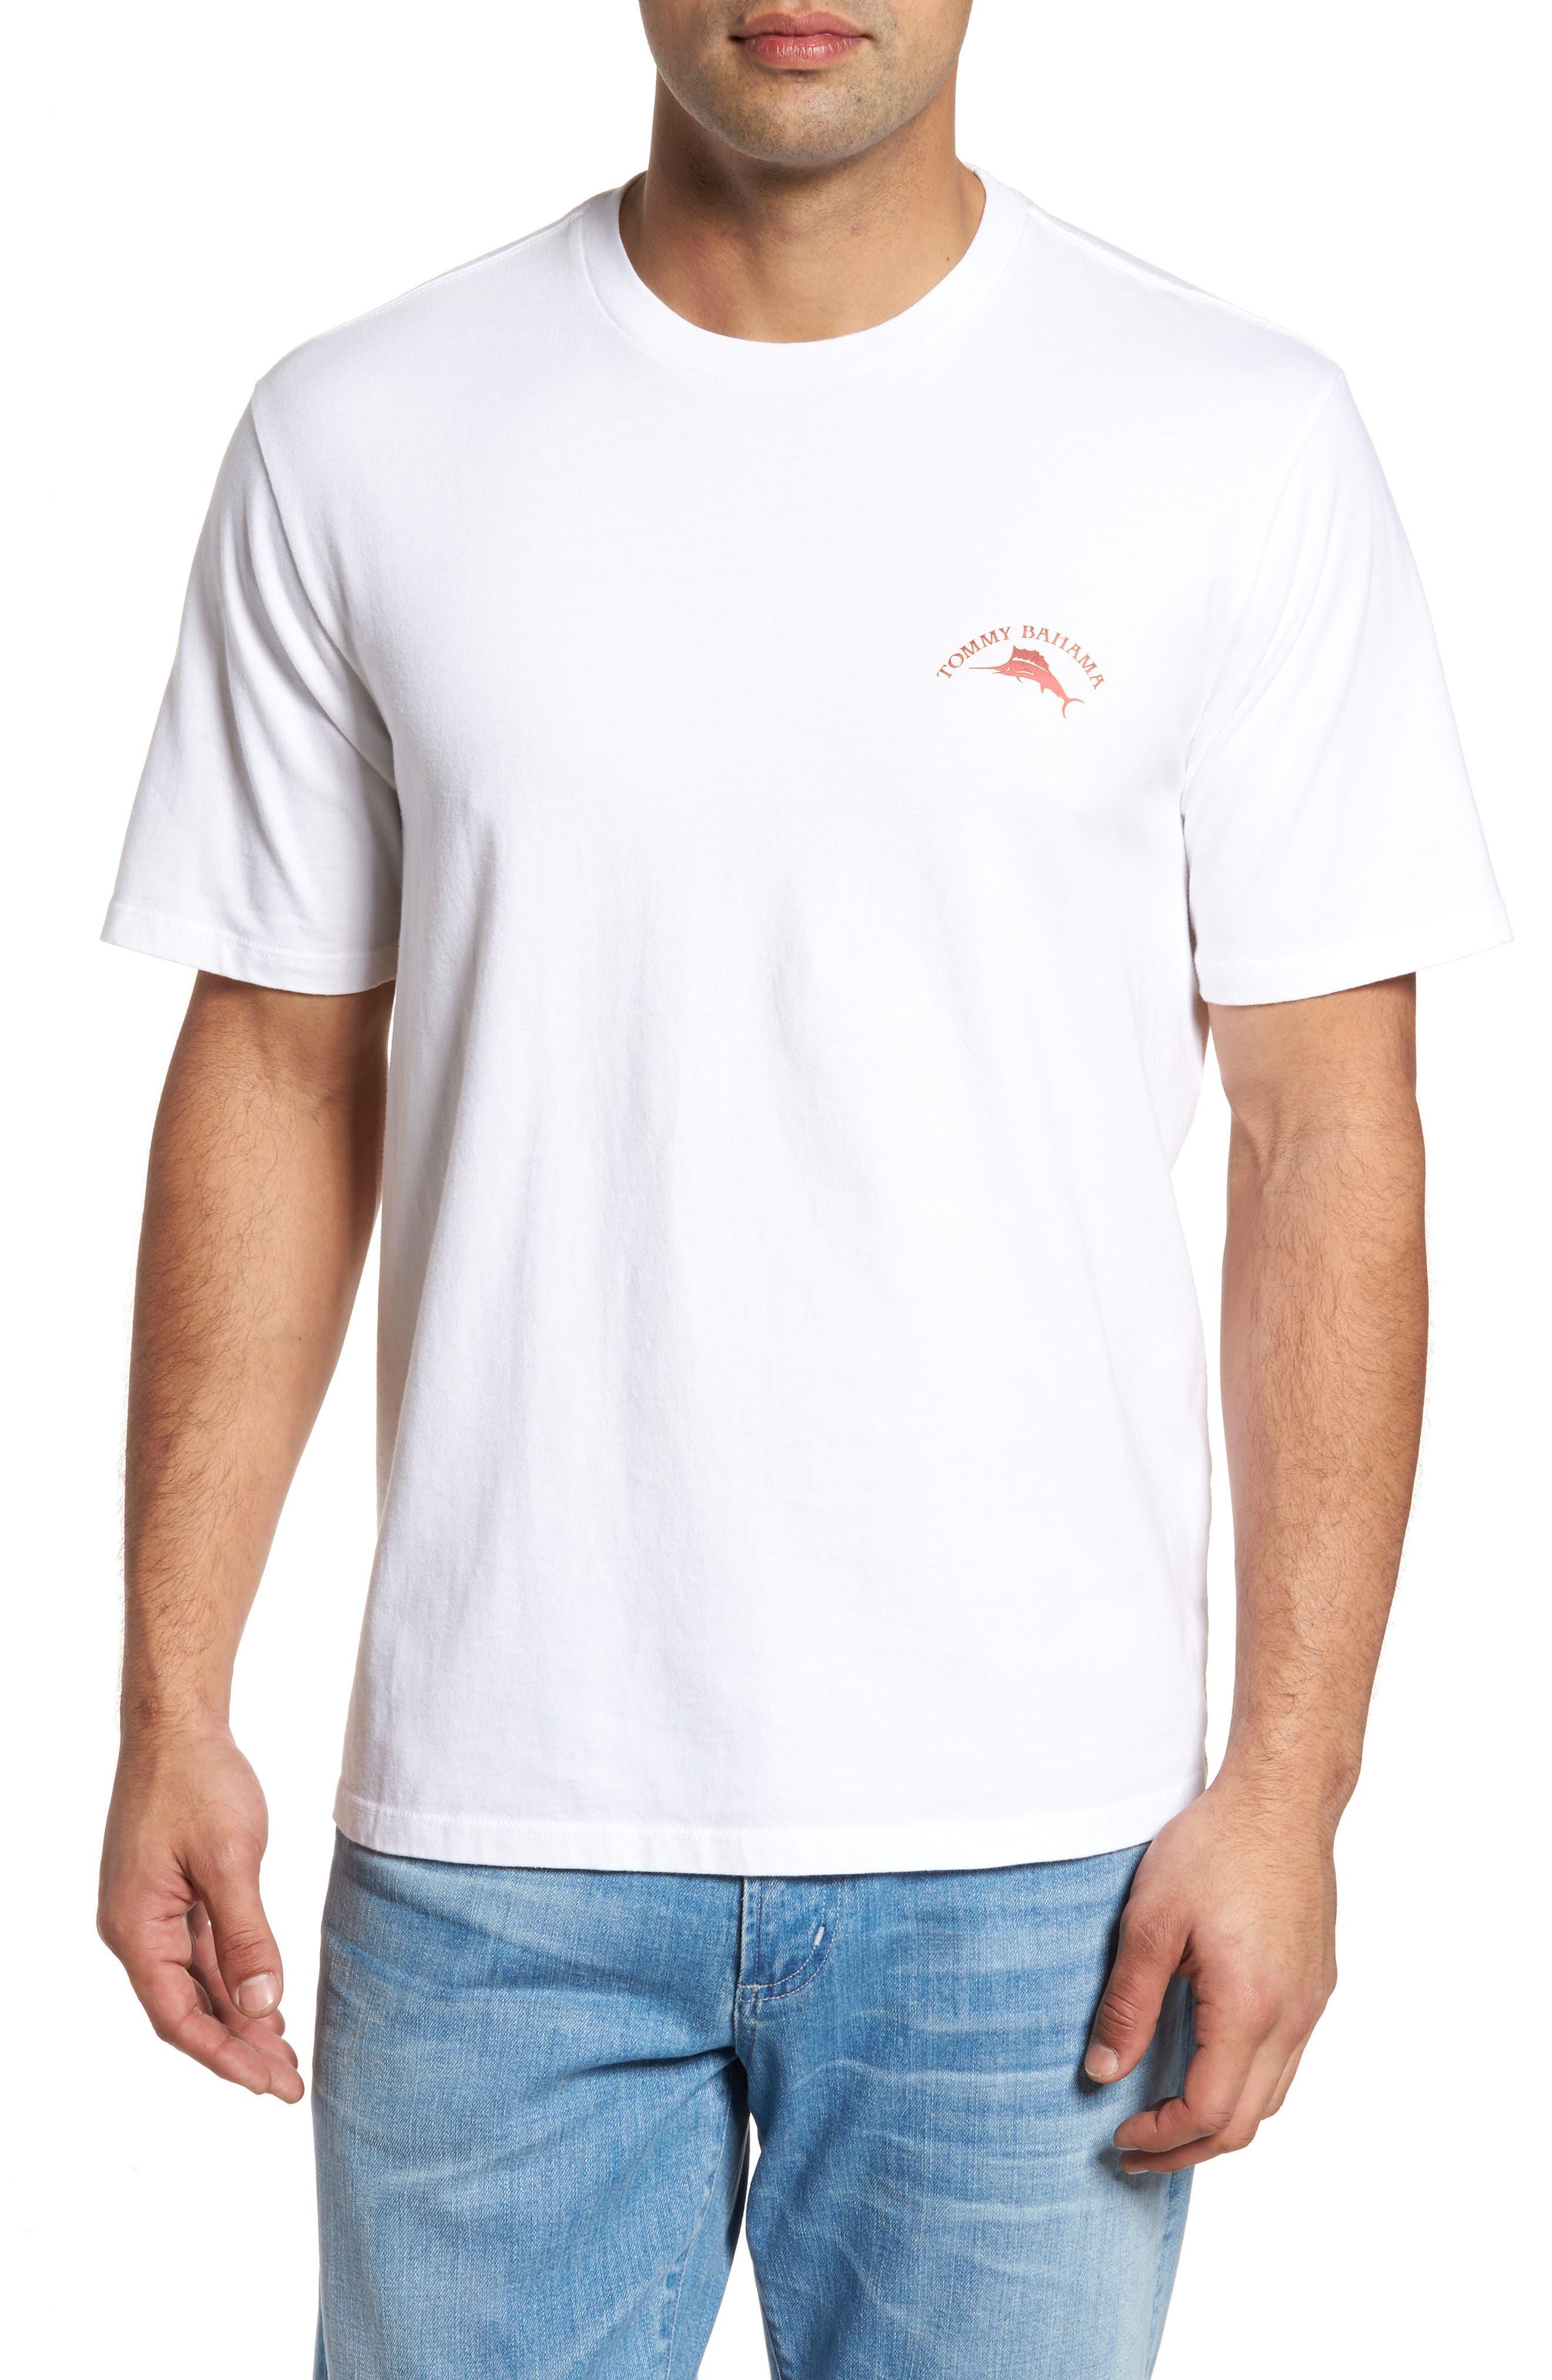 Zinspiration Graphic T-Shirt,                             Main thumbnail 1, color,                             100